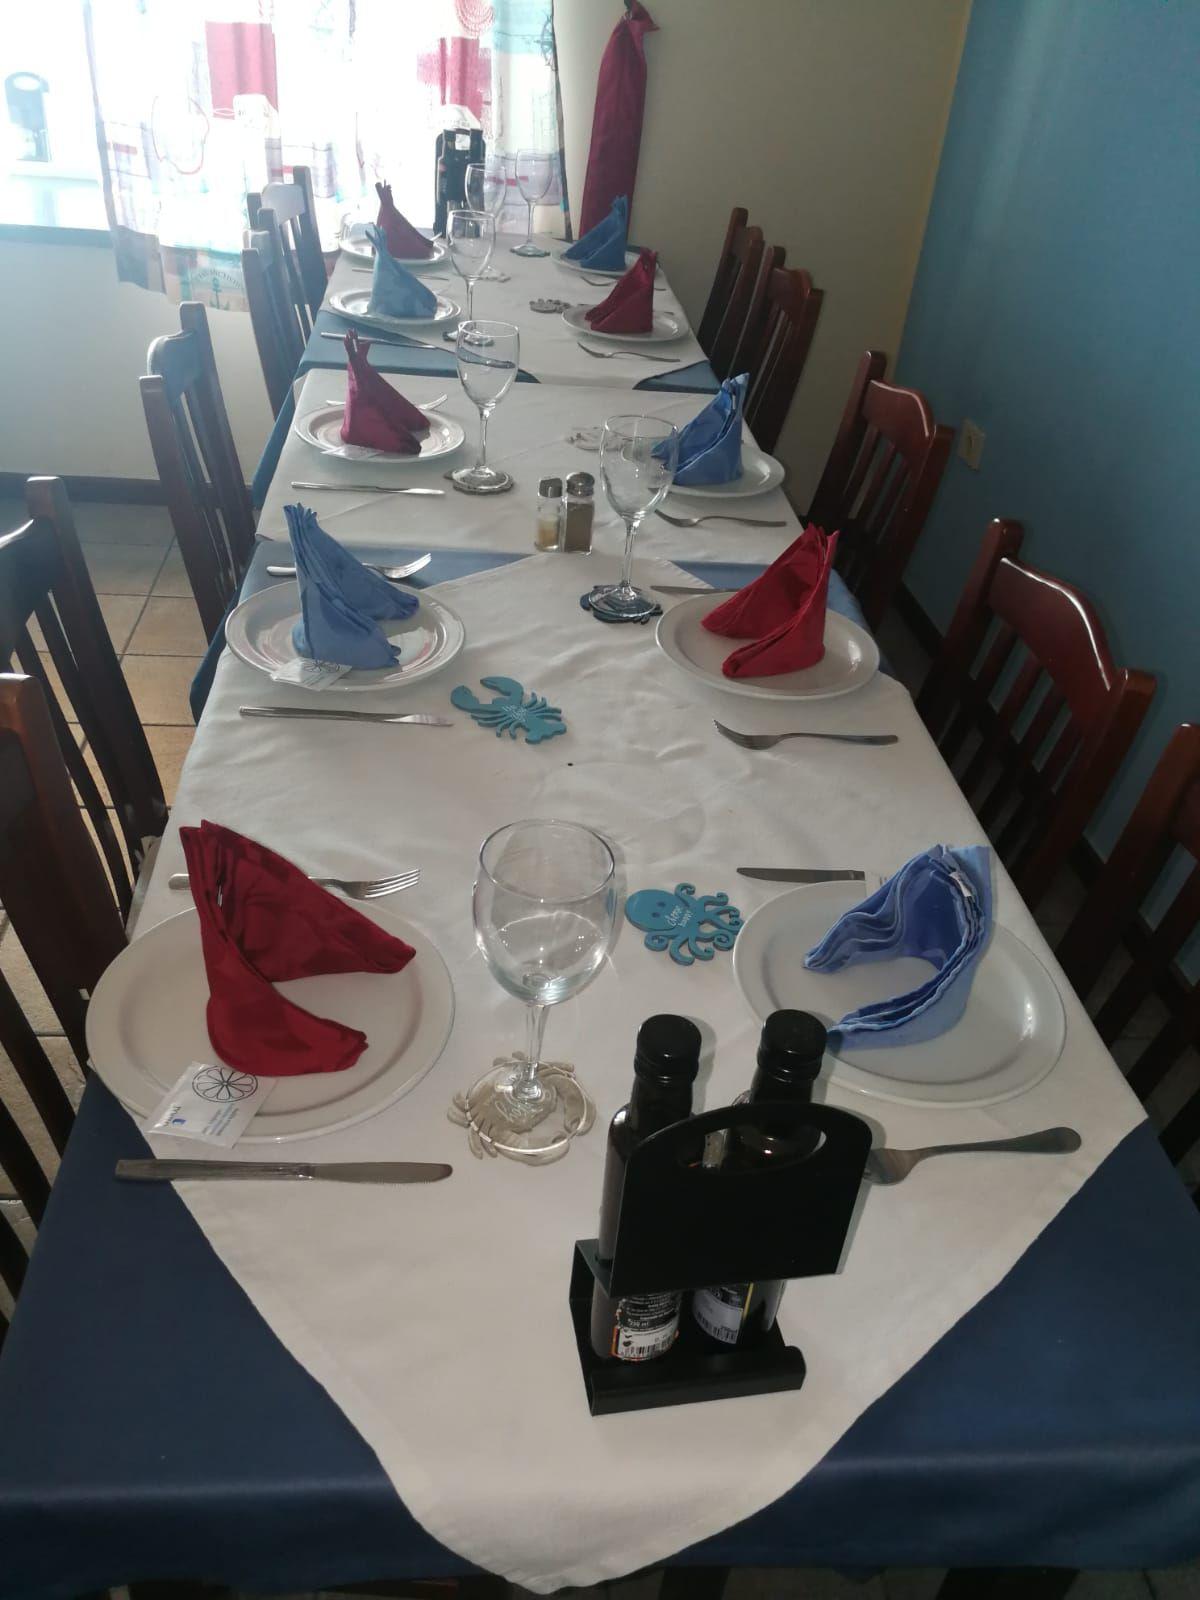 Restaurante de comida casera en La Oliva, Las Palmas